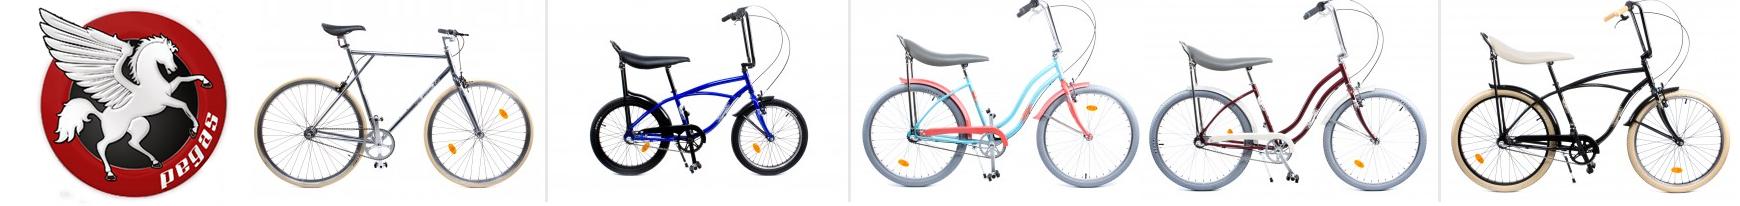 Noile biciclete de oras de la Pegas – legenda continua